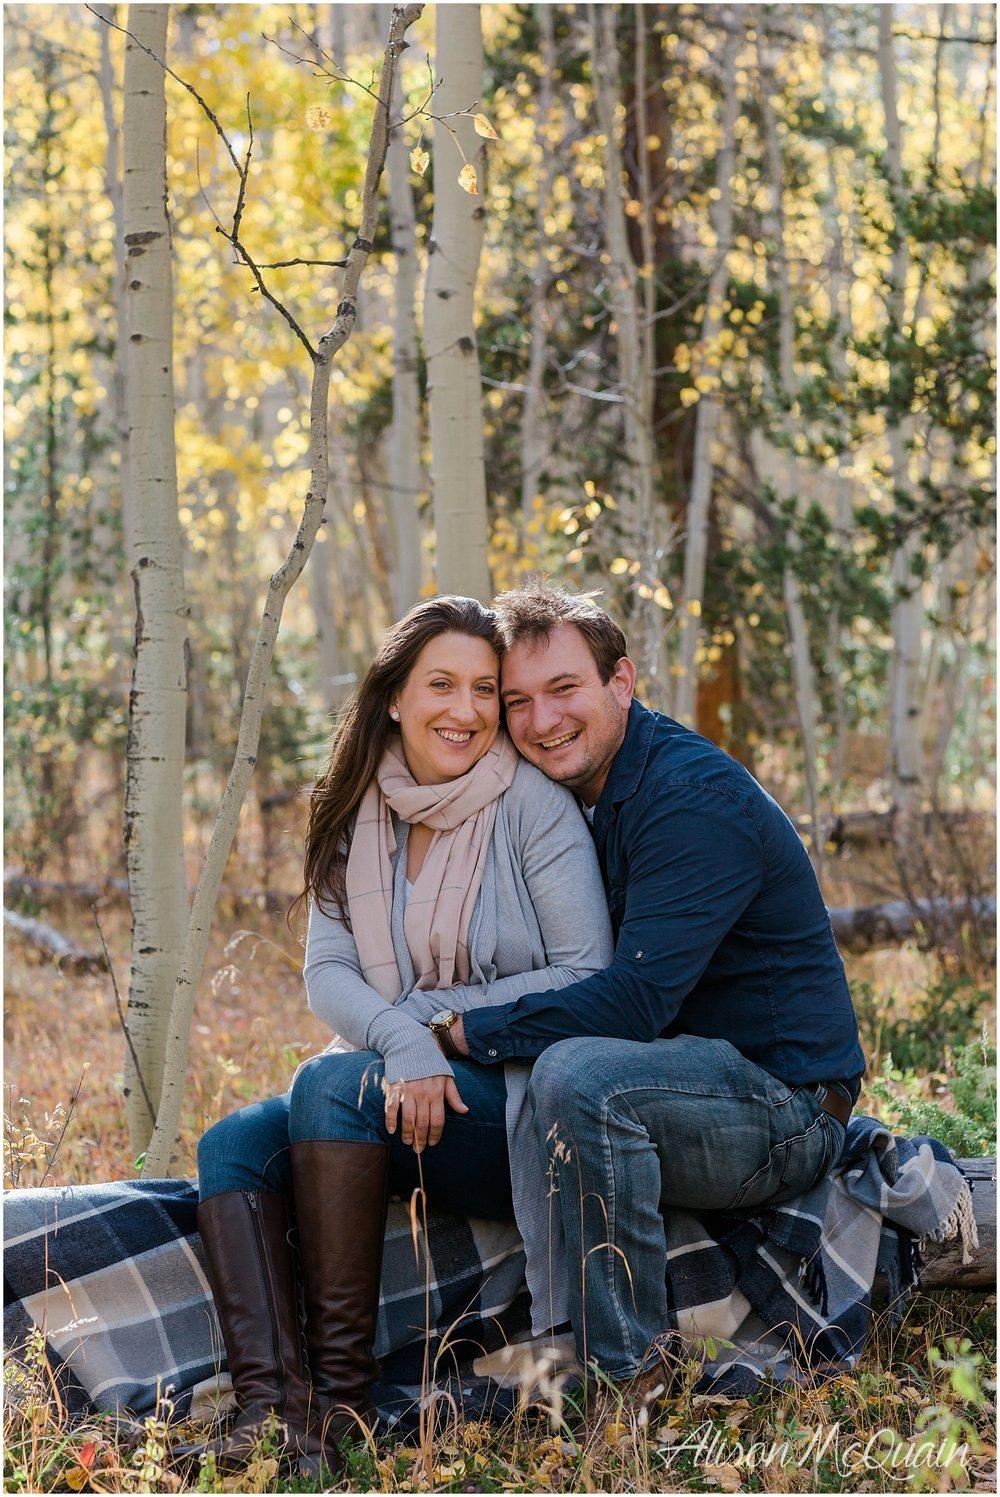 Engagement_Andrea_Andy_Fall_KenoshaPass_Colorado_AlisonMcQuainPhotography_0014.jpg